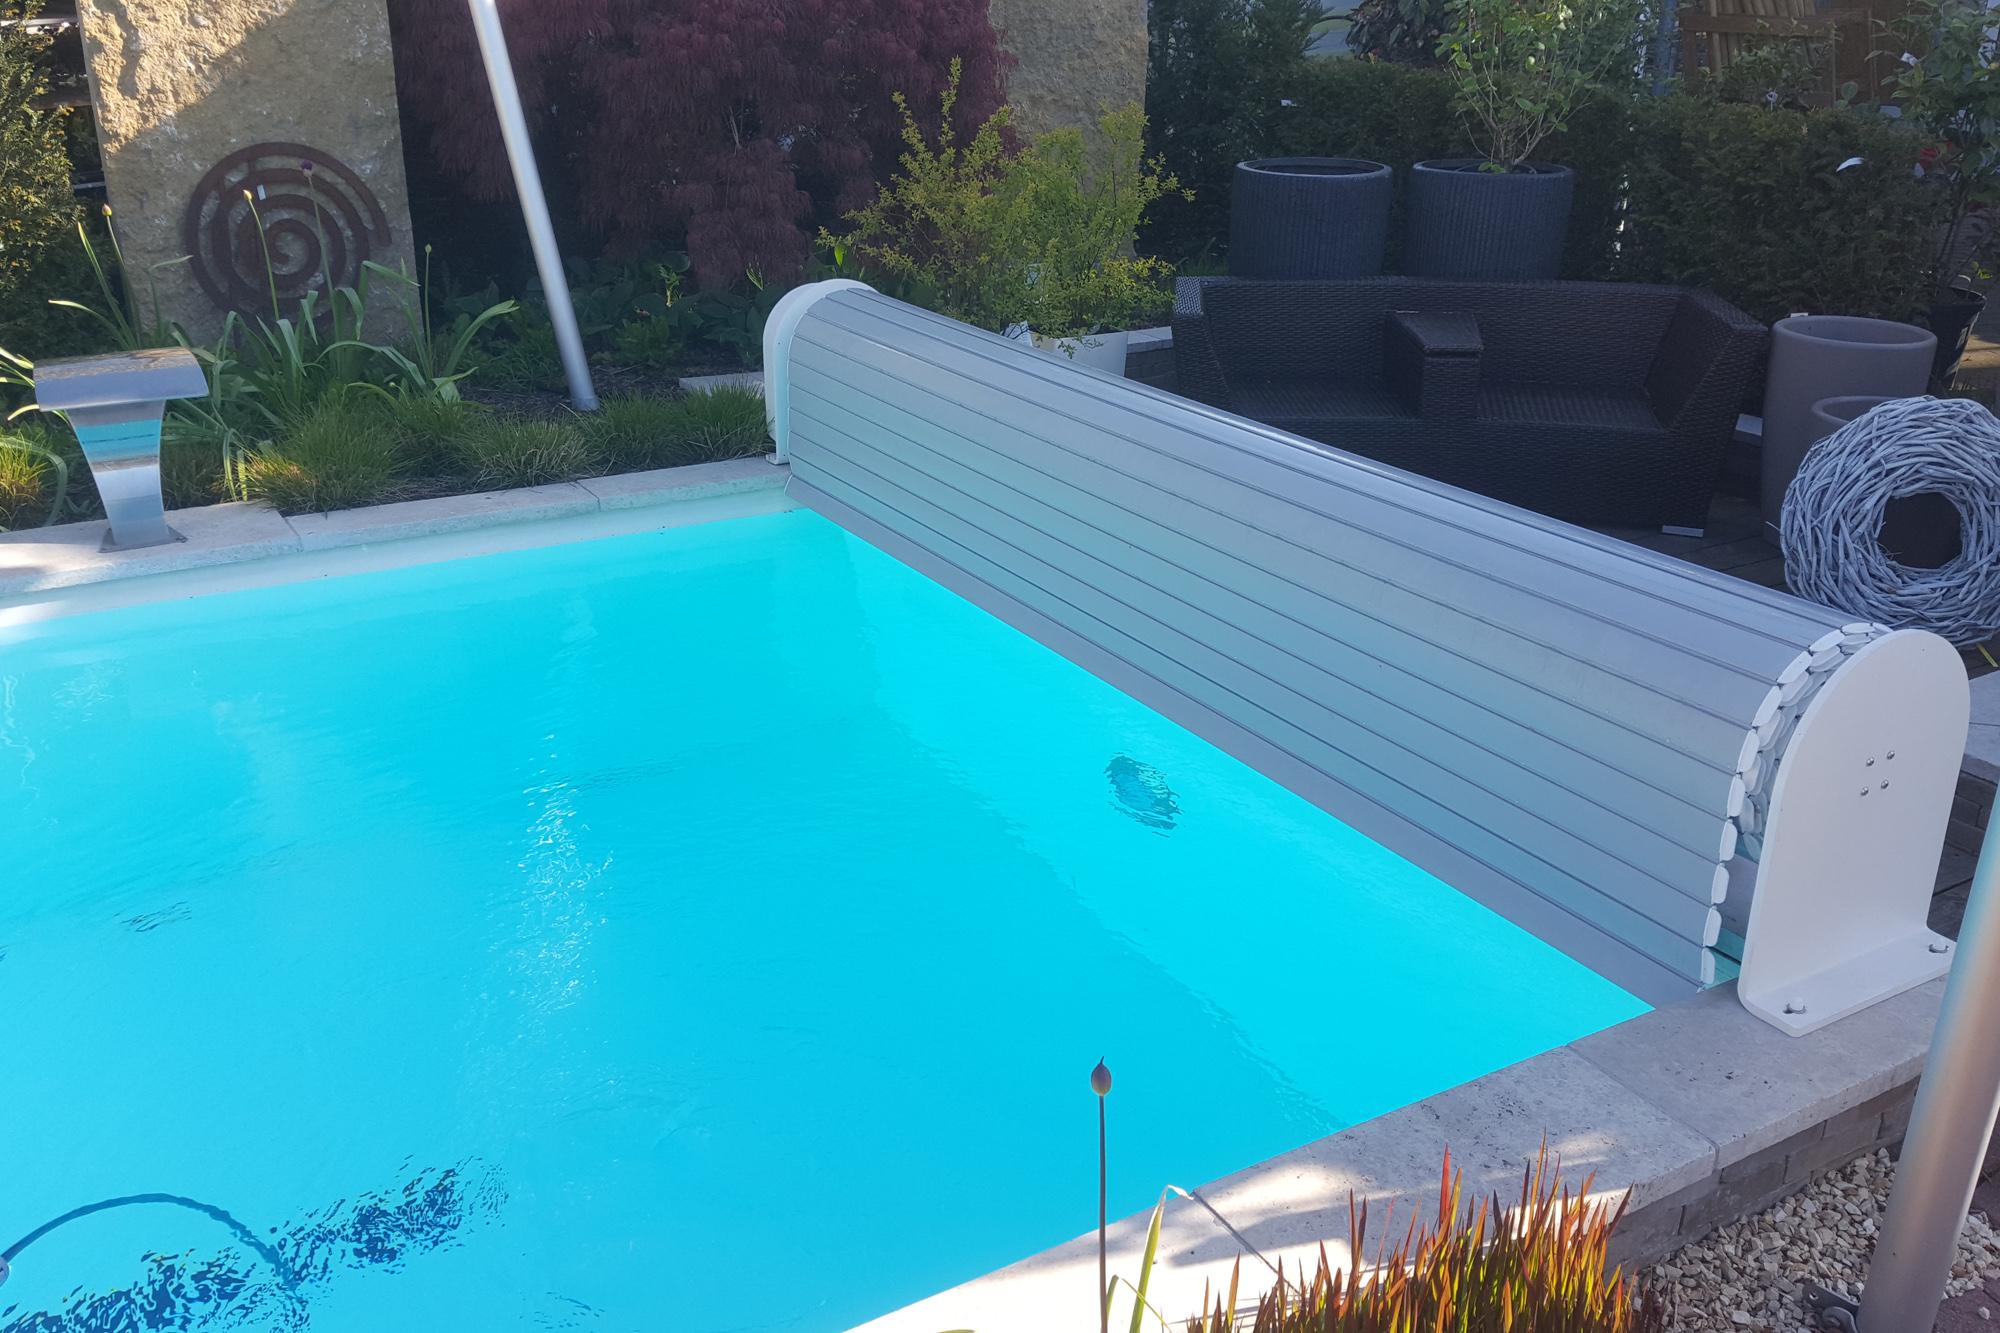 oberflur rollladenabdeckung an einem wei en gartenbad 556 veltmann fertigschwimmbecken. Black Bedroom Furniture Sets. Home Design Ideas